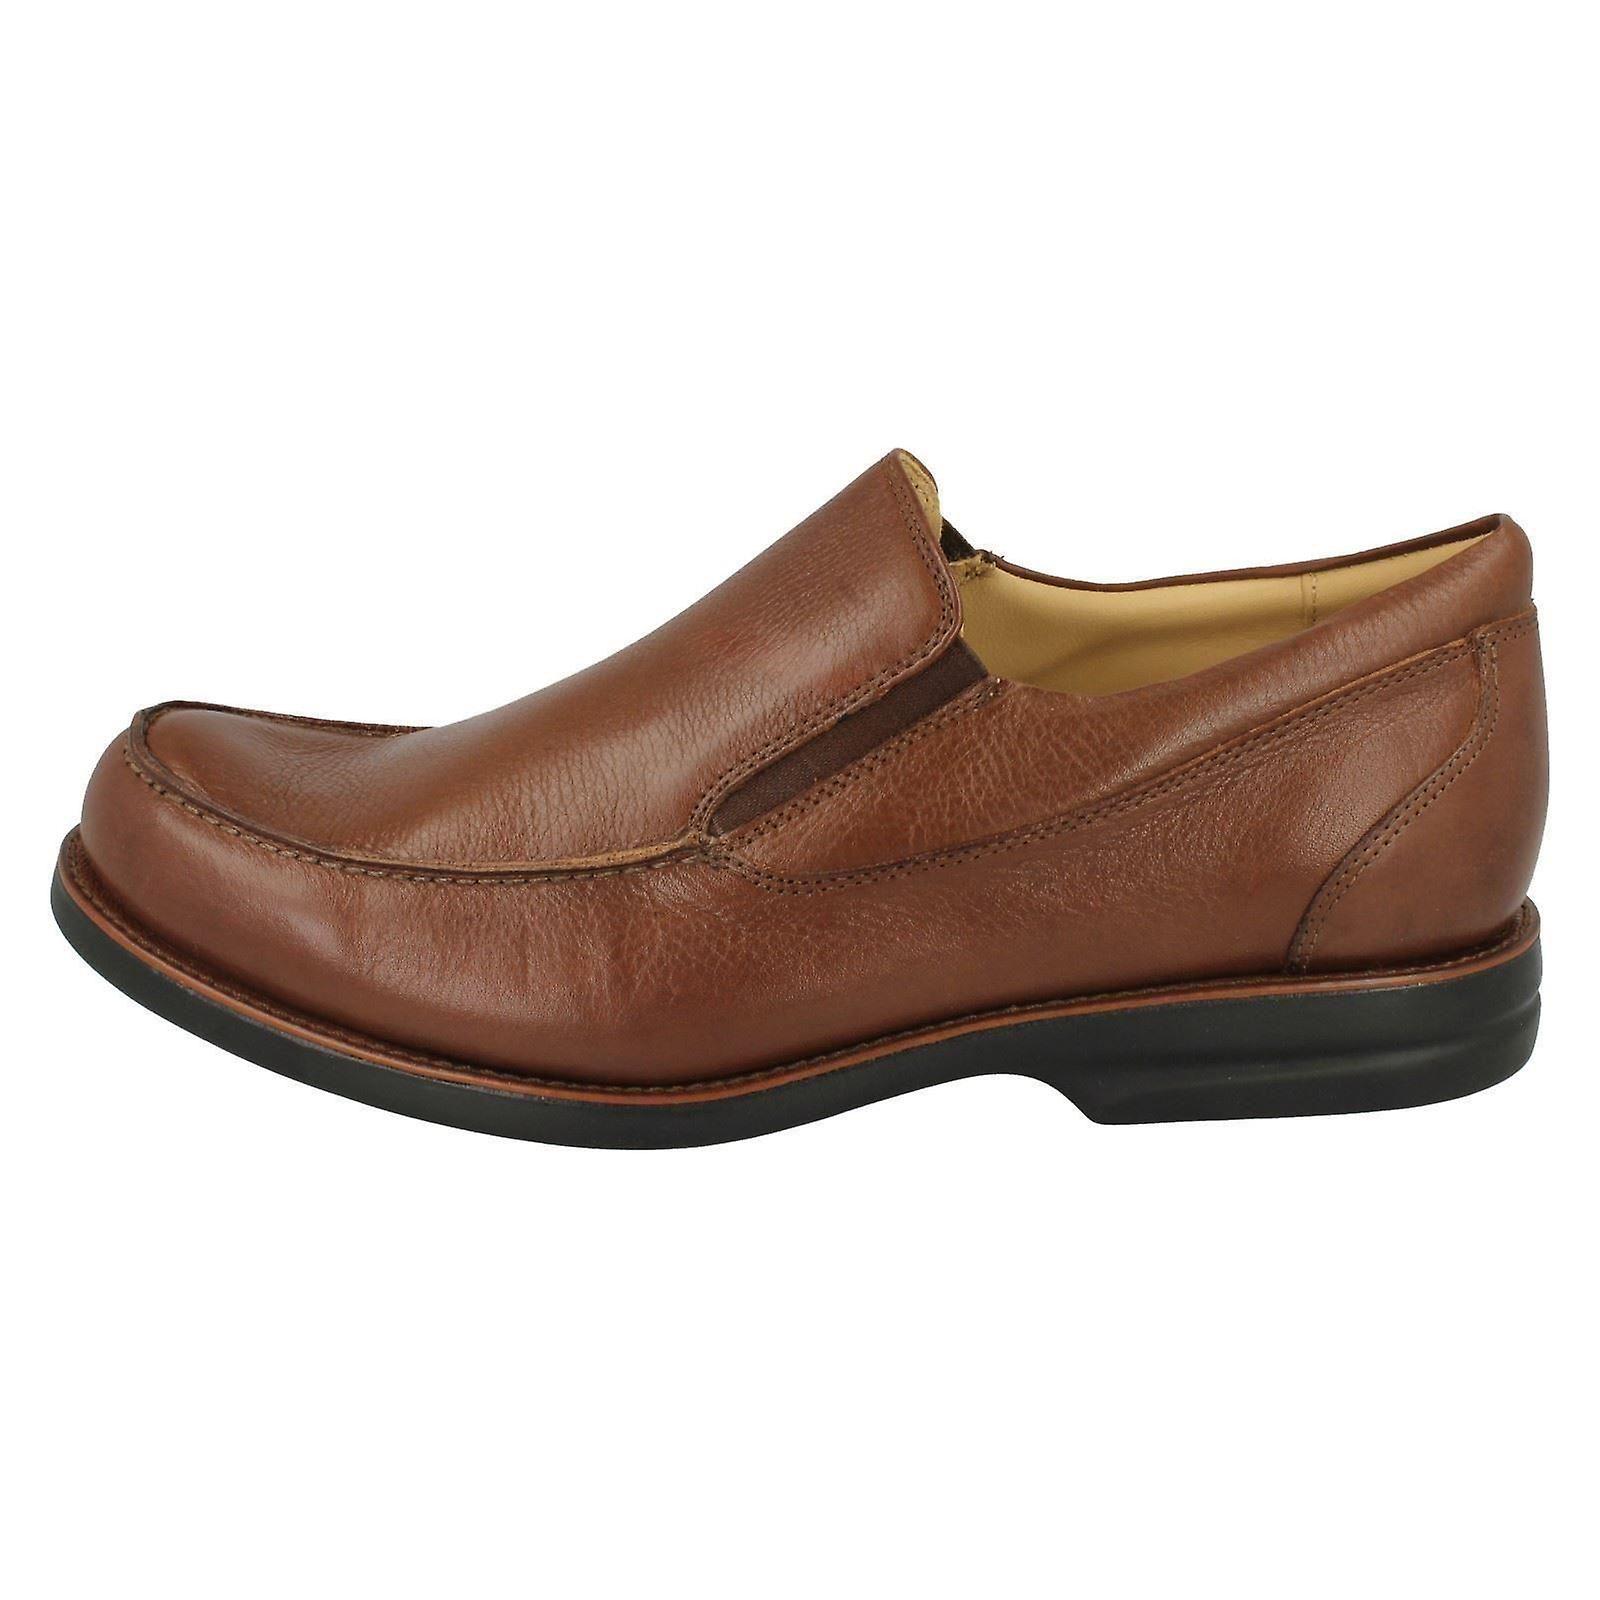 Herren anatomische Slip-on Schuhe Bernardo